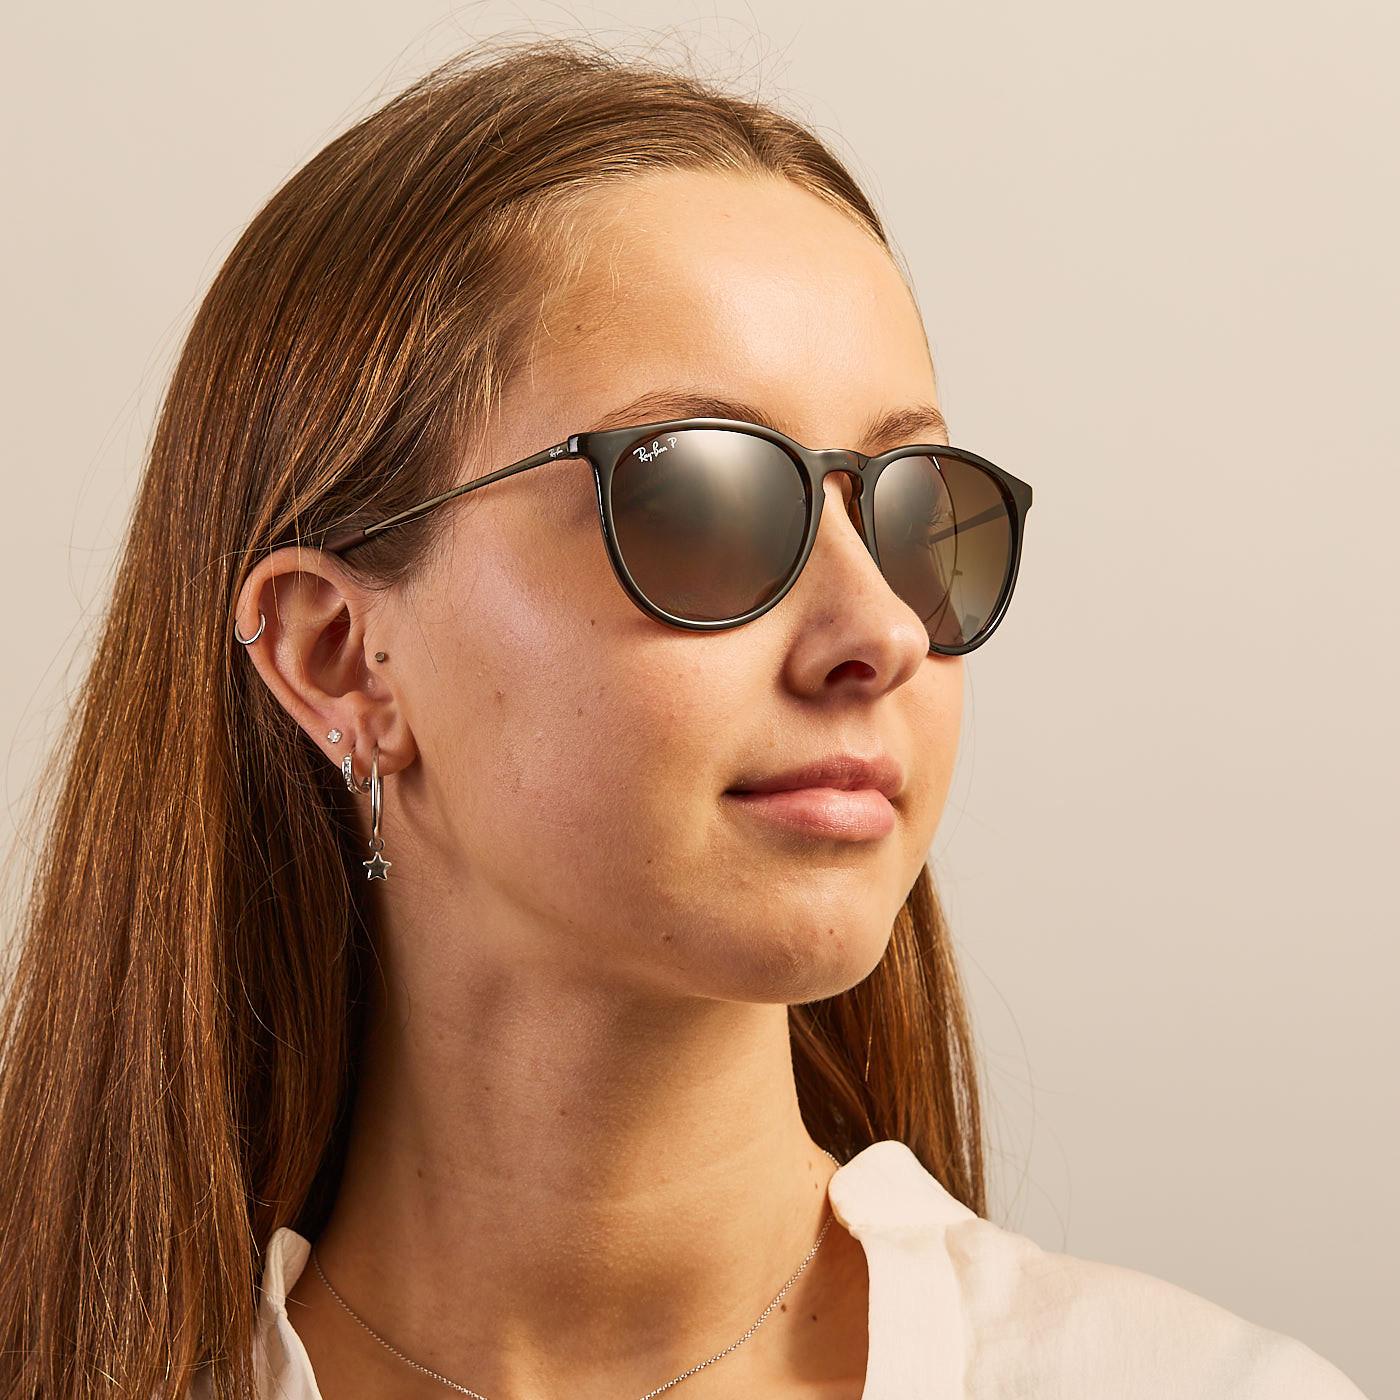 12a29489721a Ray-Ban Erika Havana Polarized Sunglasses RB4171 710 T5 - Sunglasses